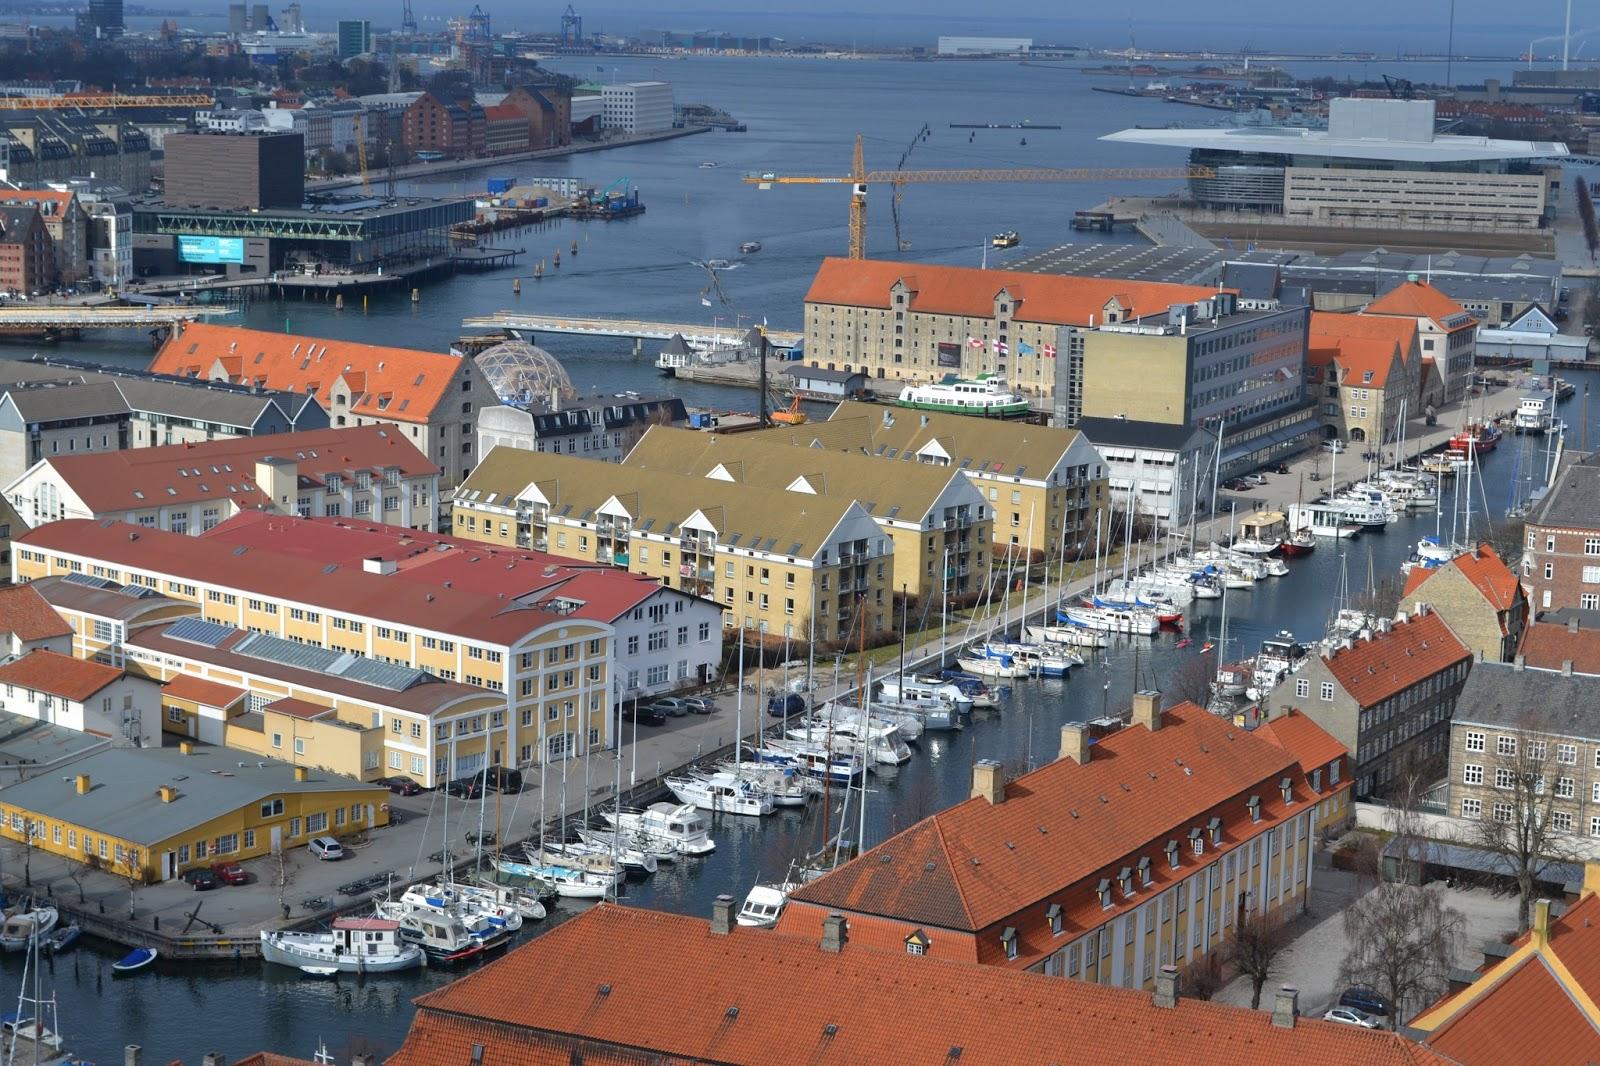 Oraşul Copenhaga, Danemarca